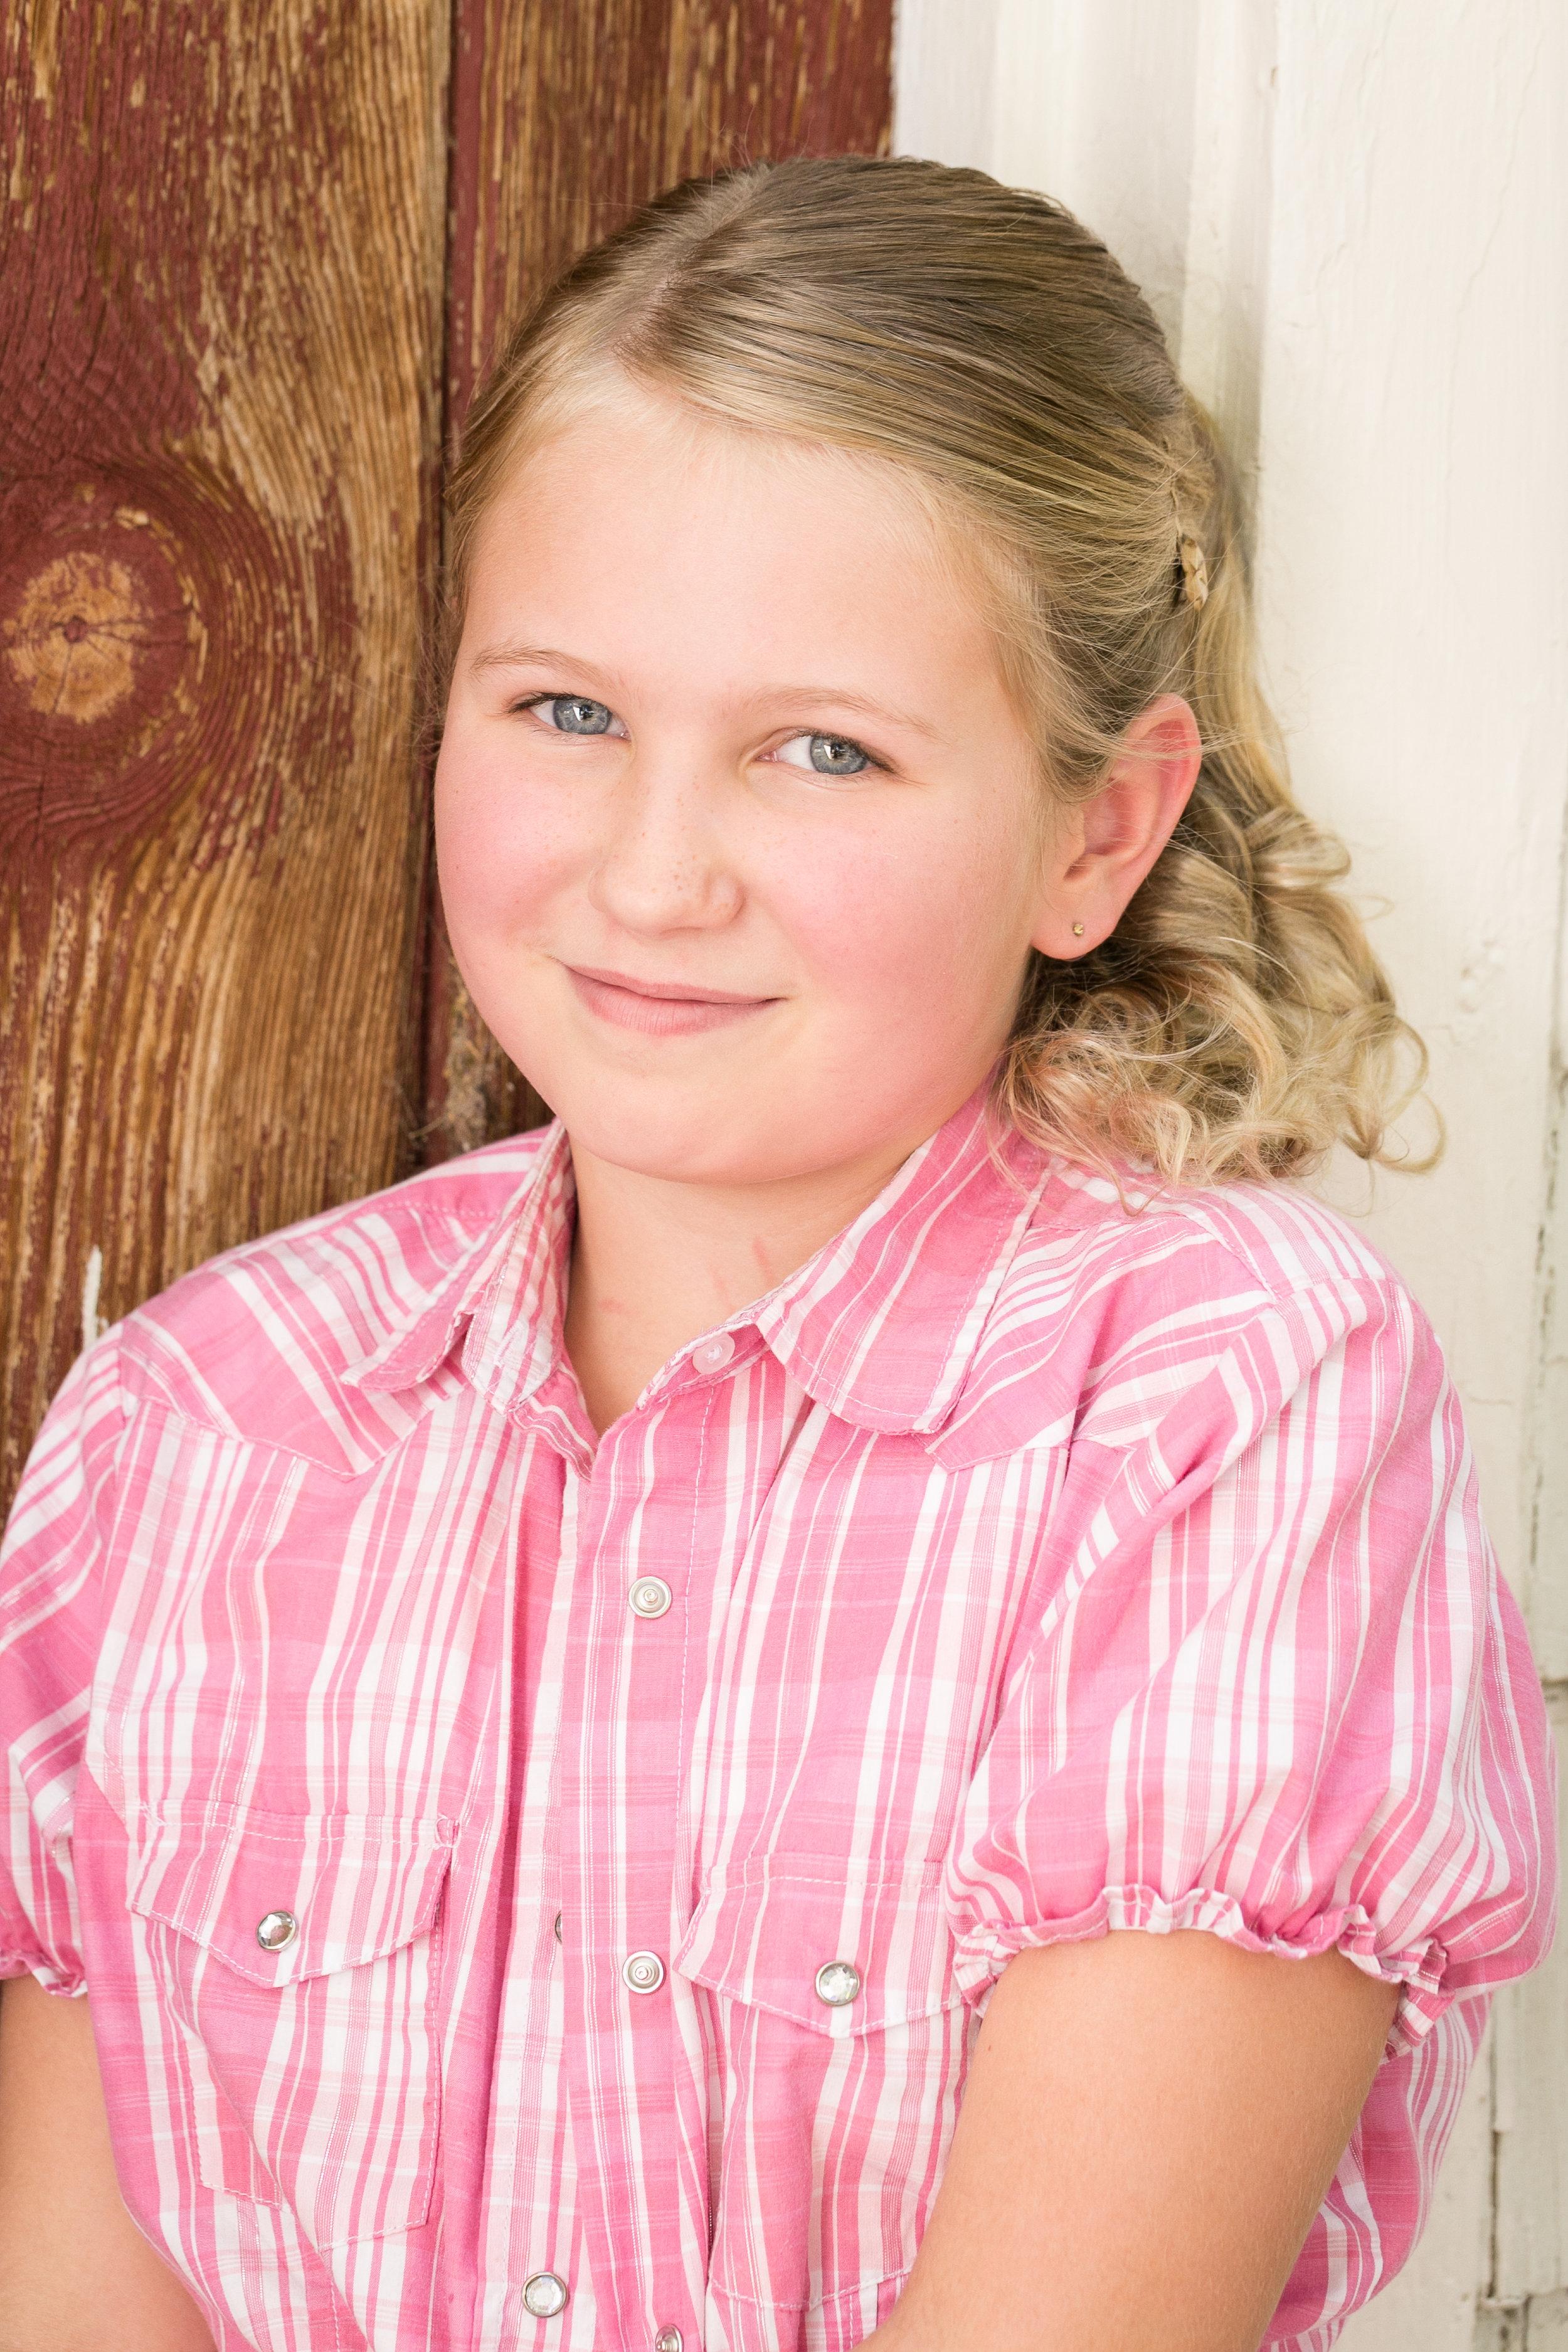 Little Sarah's peaches & cream complexion is a tween photographer's dream!